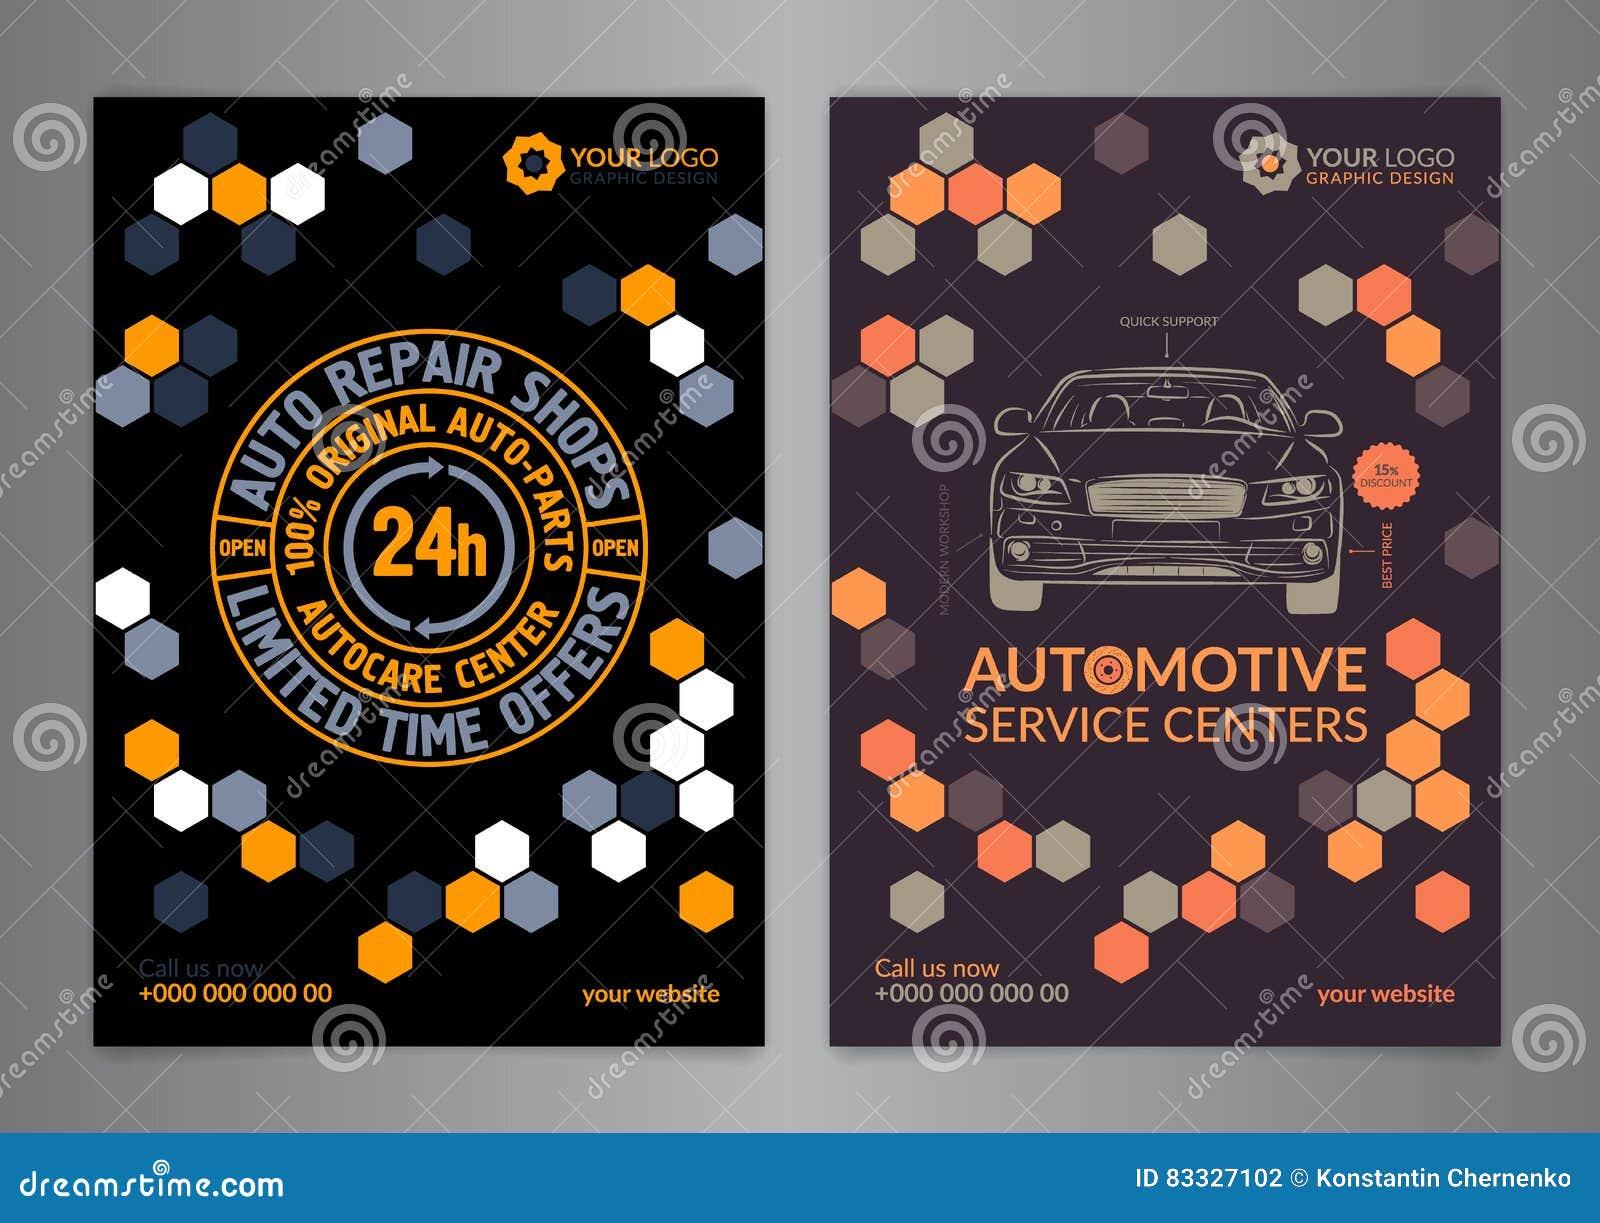 Set Automotive Service Centers Business Layout Templates A5 A4 Auto Repair Shop Brochure Templates Automobile Magazine Cover Stock Vector Illustration Of Fixing Auto 83327102